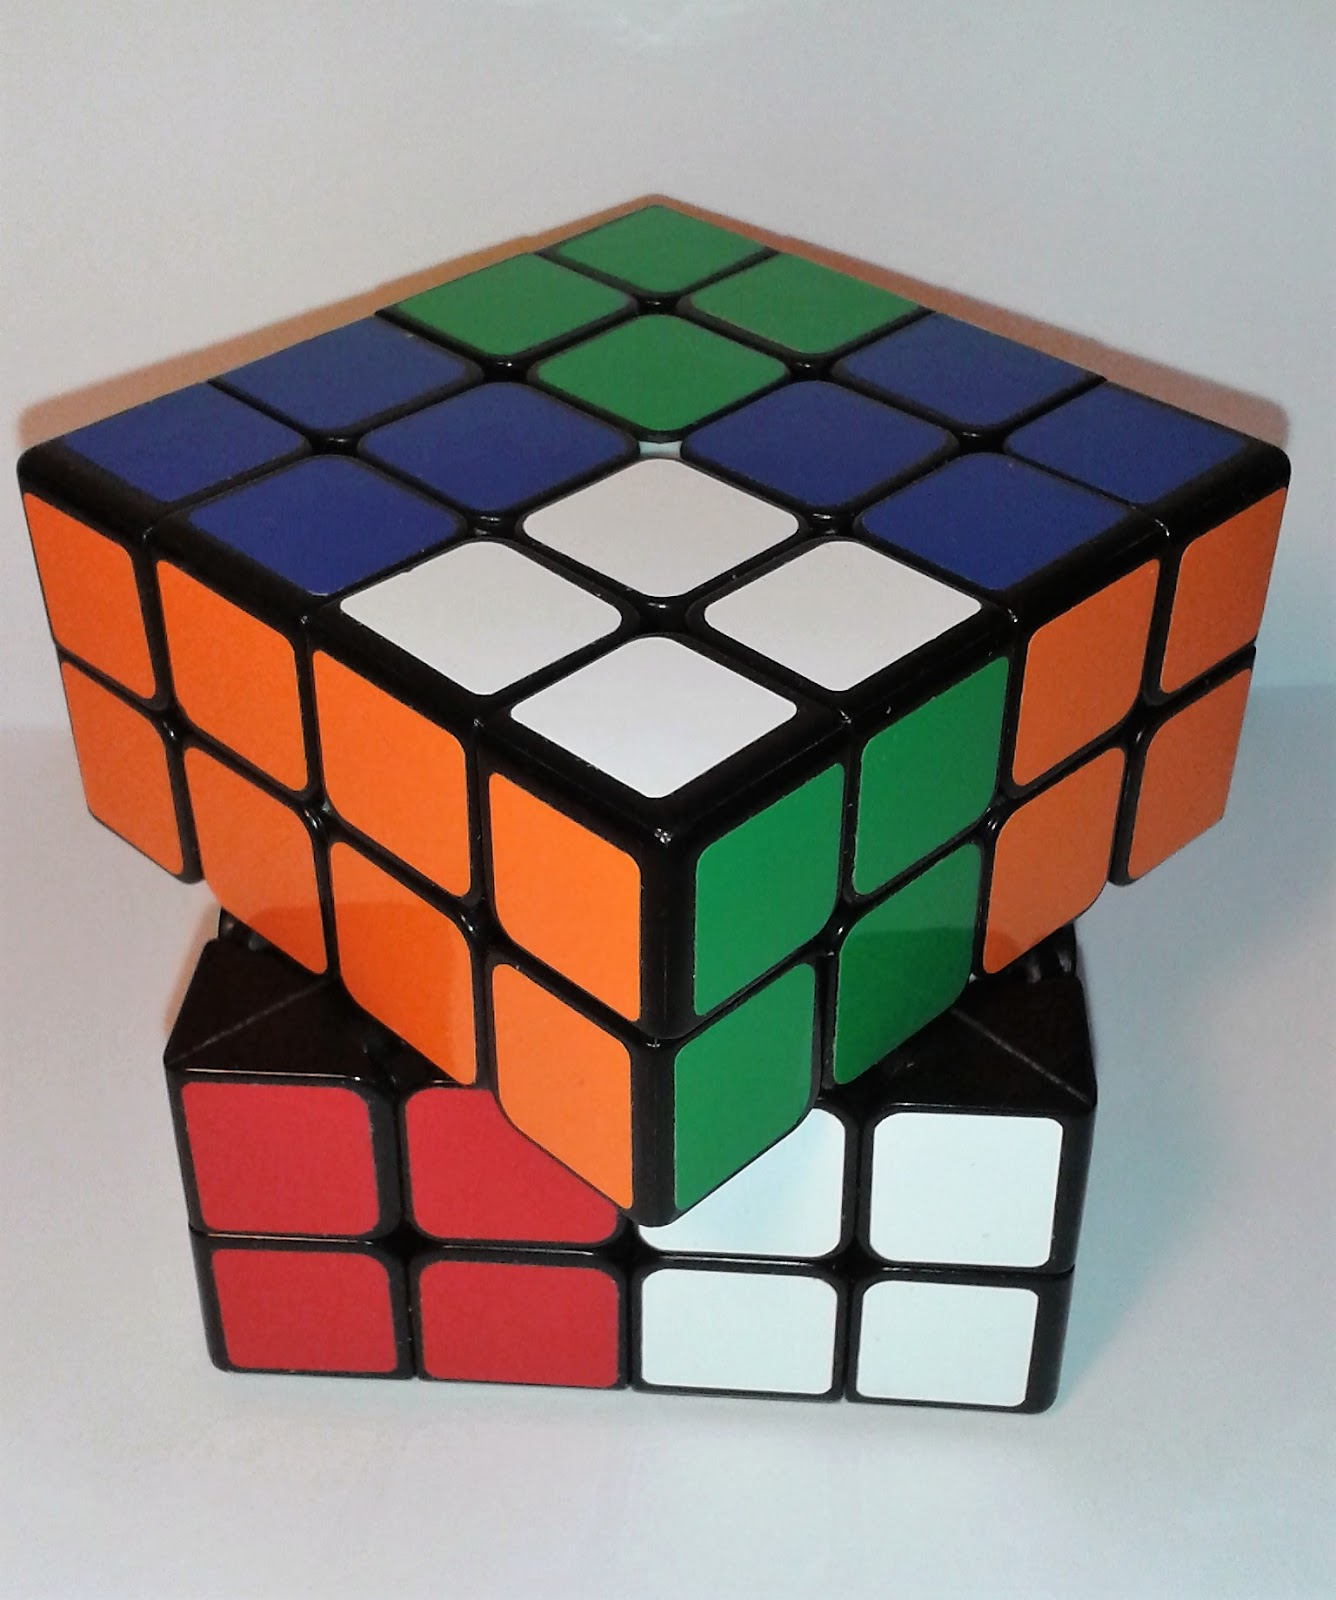 The AI method - 4x4x4 Tutorial